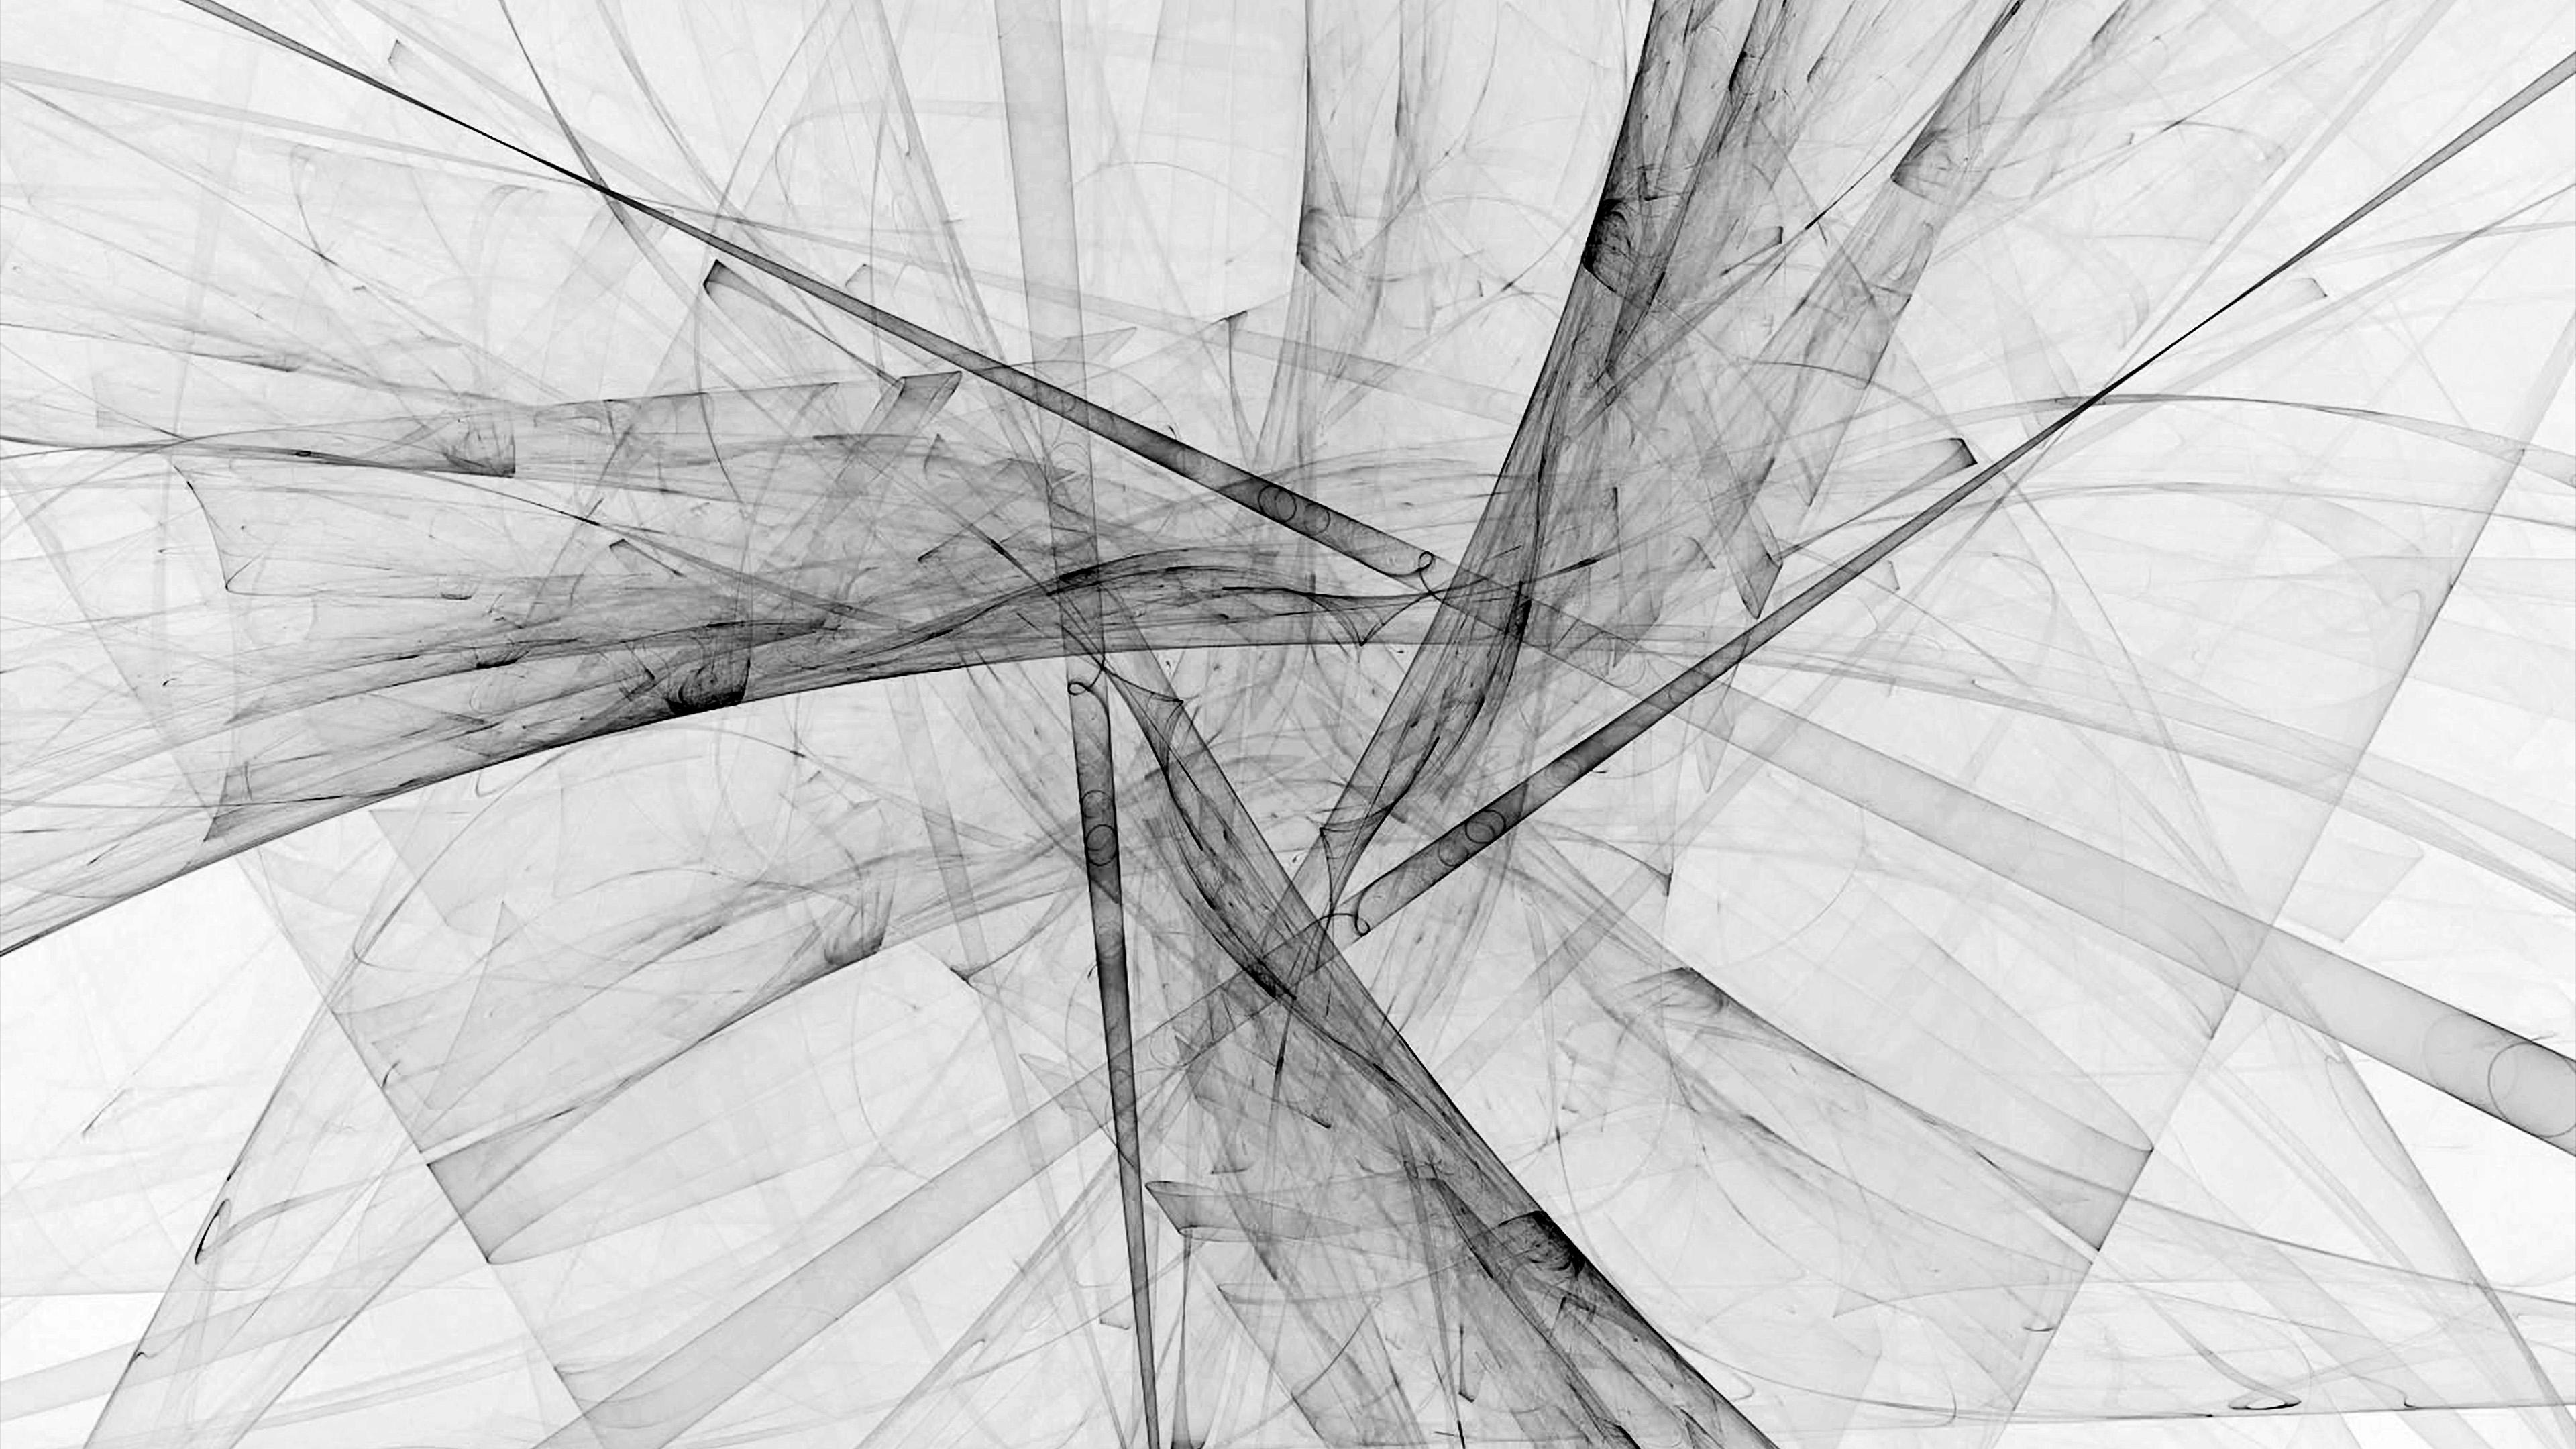 vs87 triangle art abstract bw white pattern wallpaper macbook 13 vs 15 #14